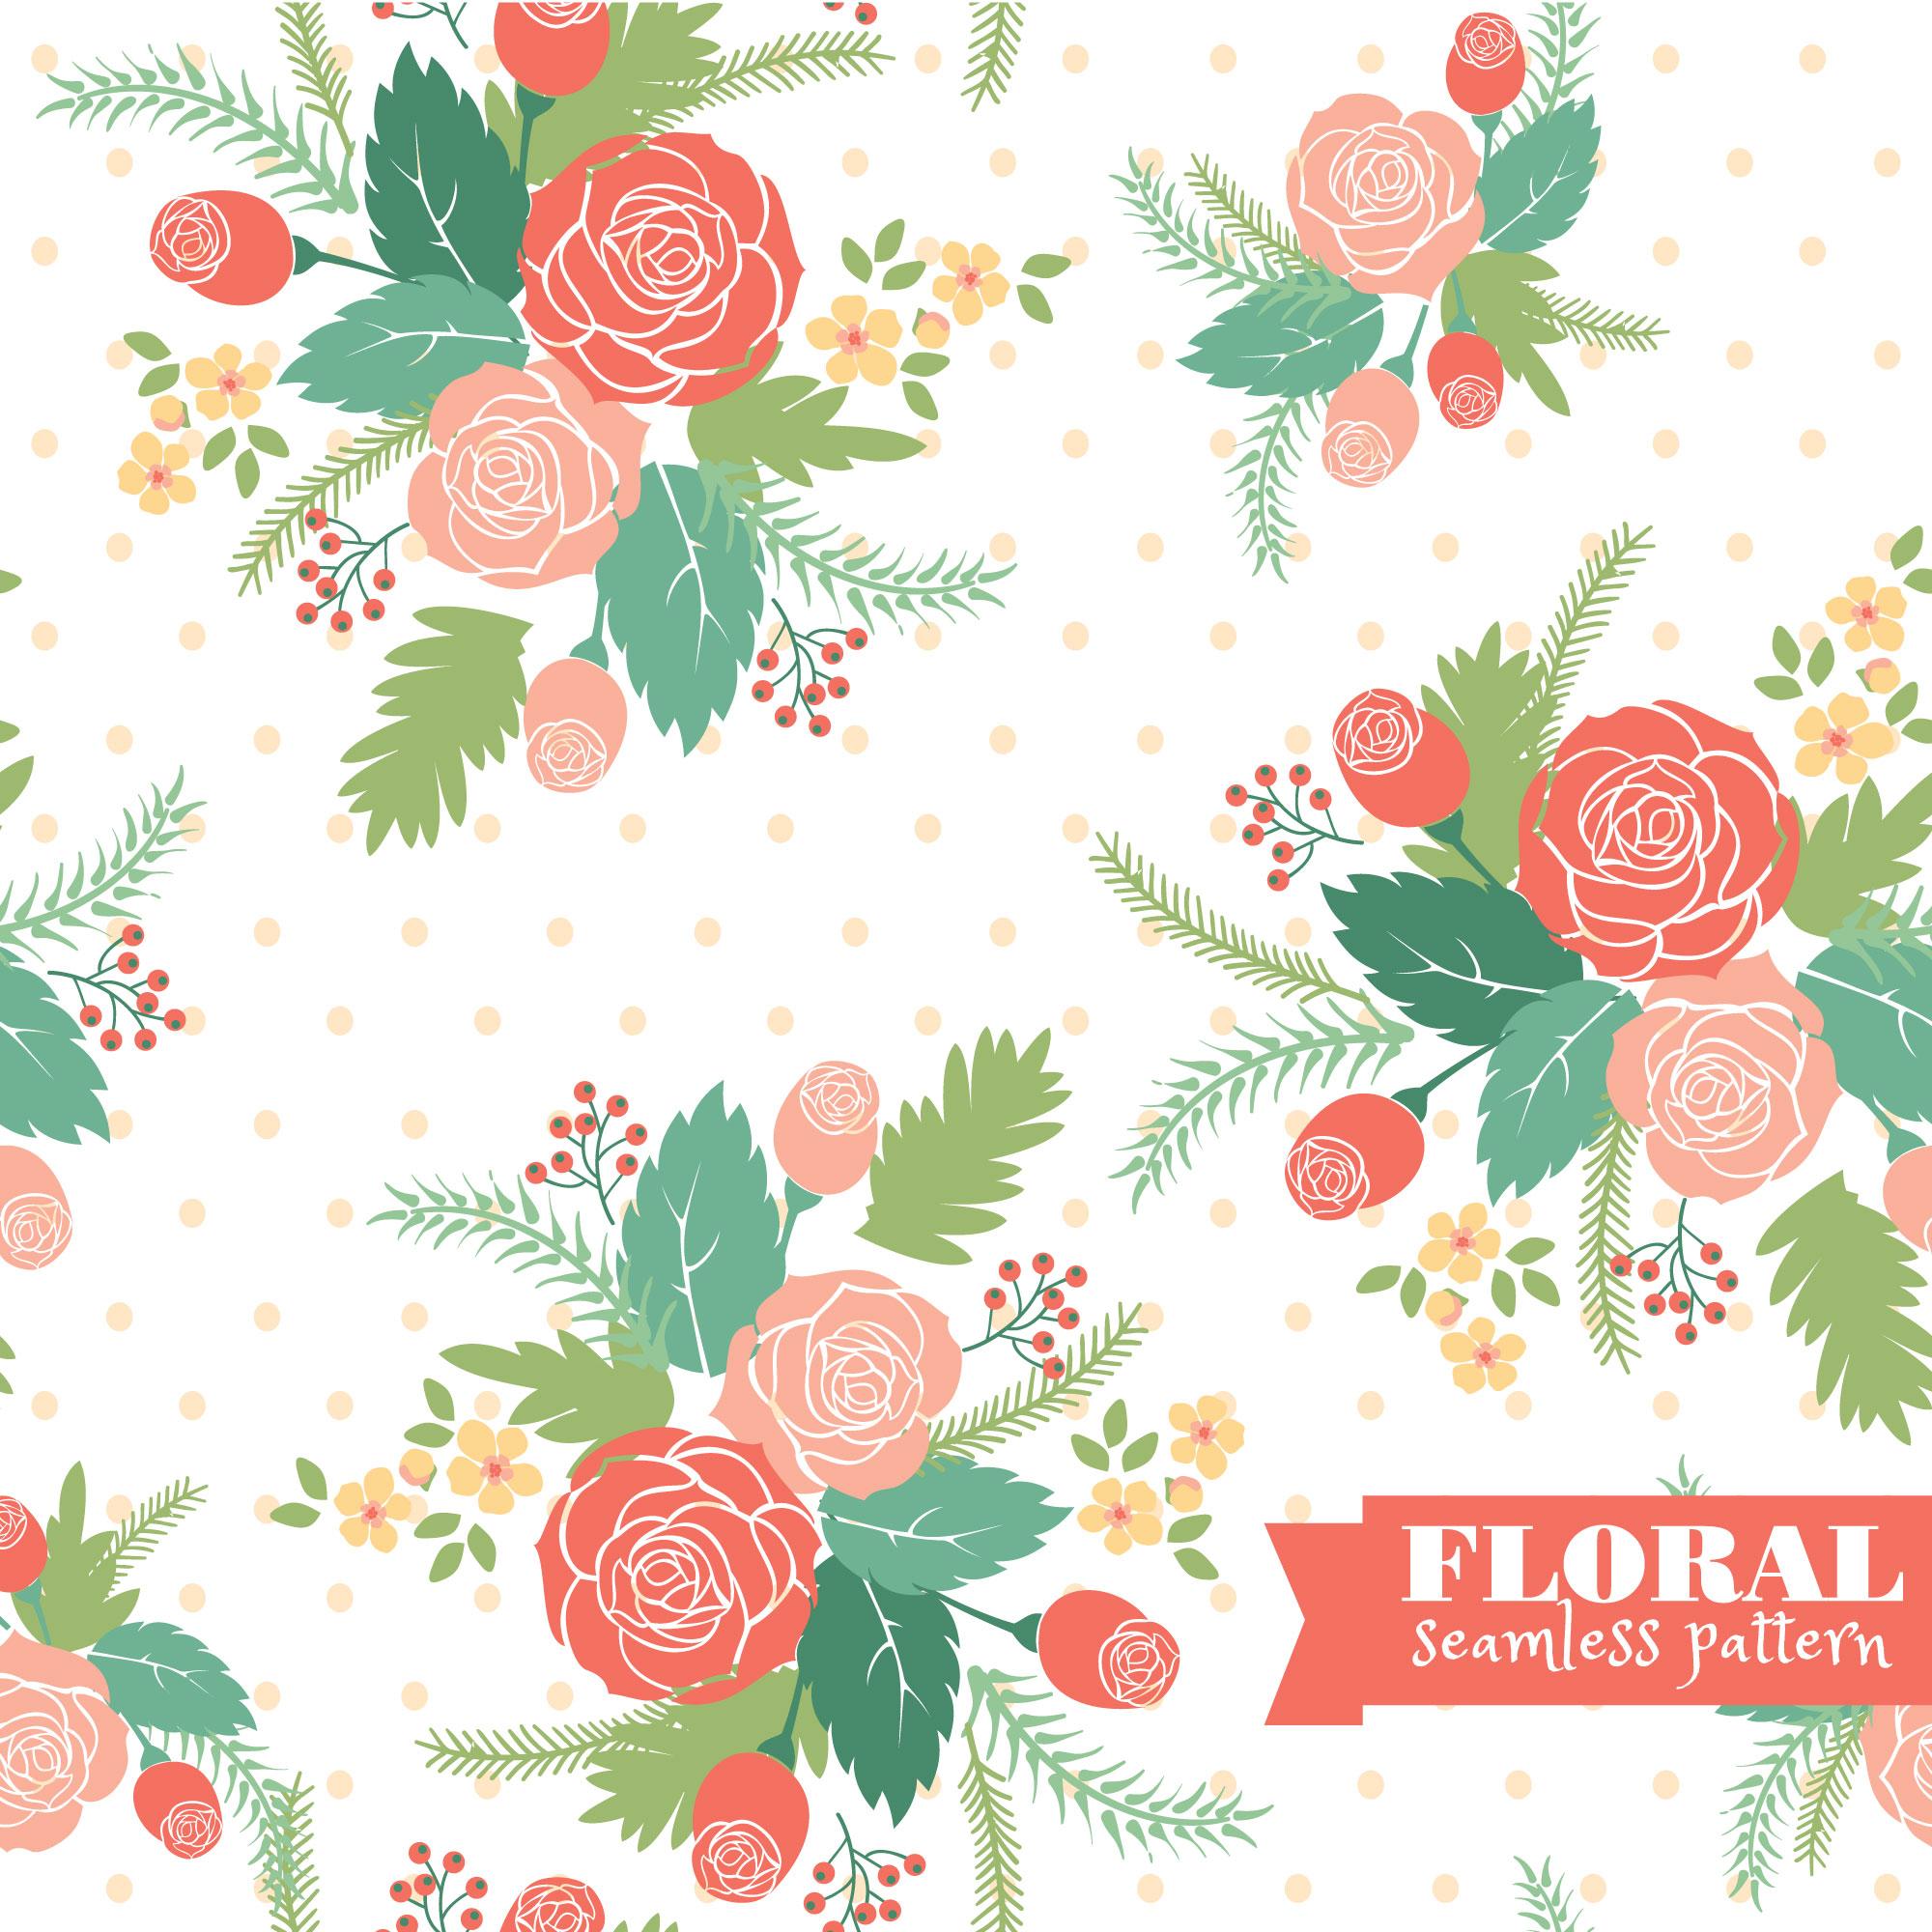 Seamless floral pattern. Photoshop brush